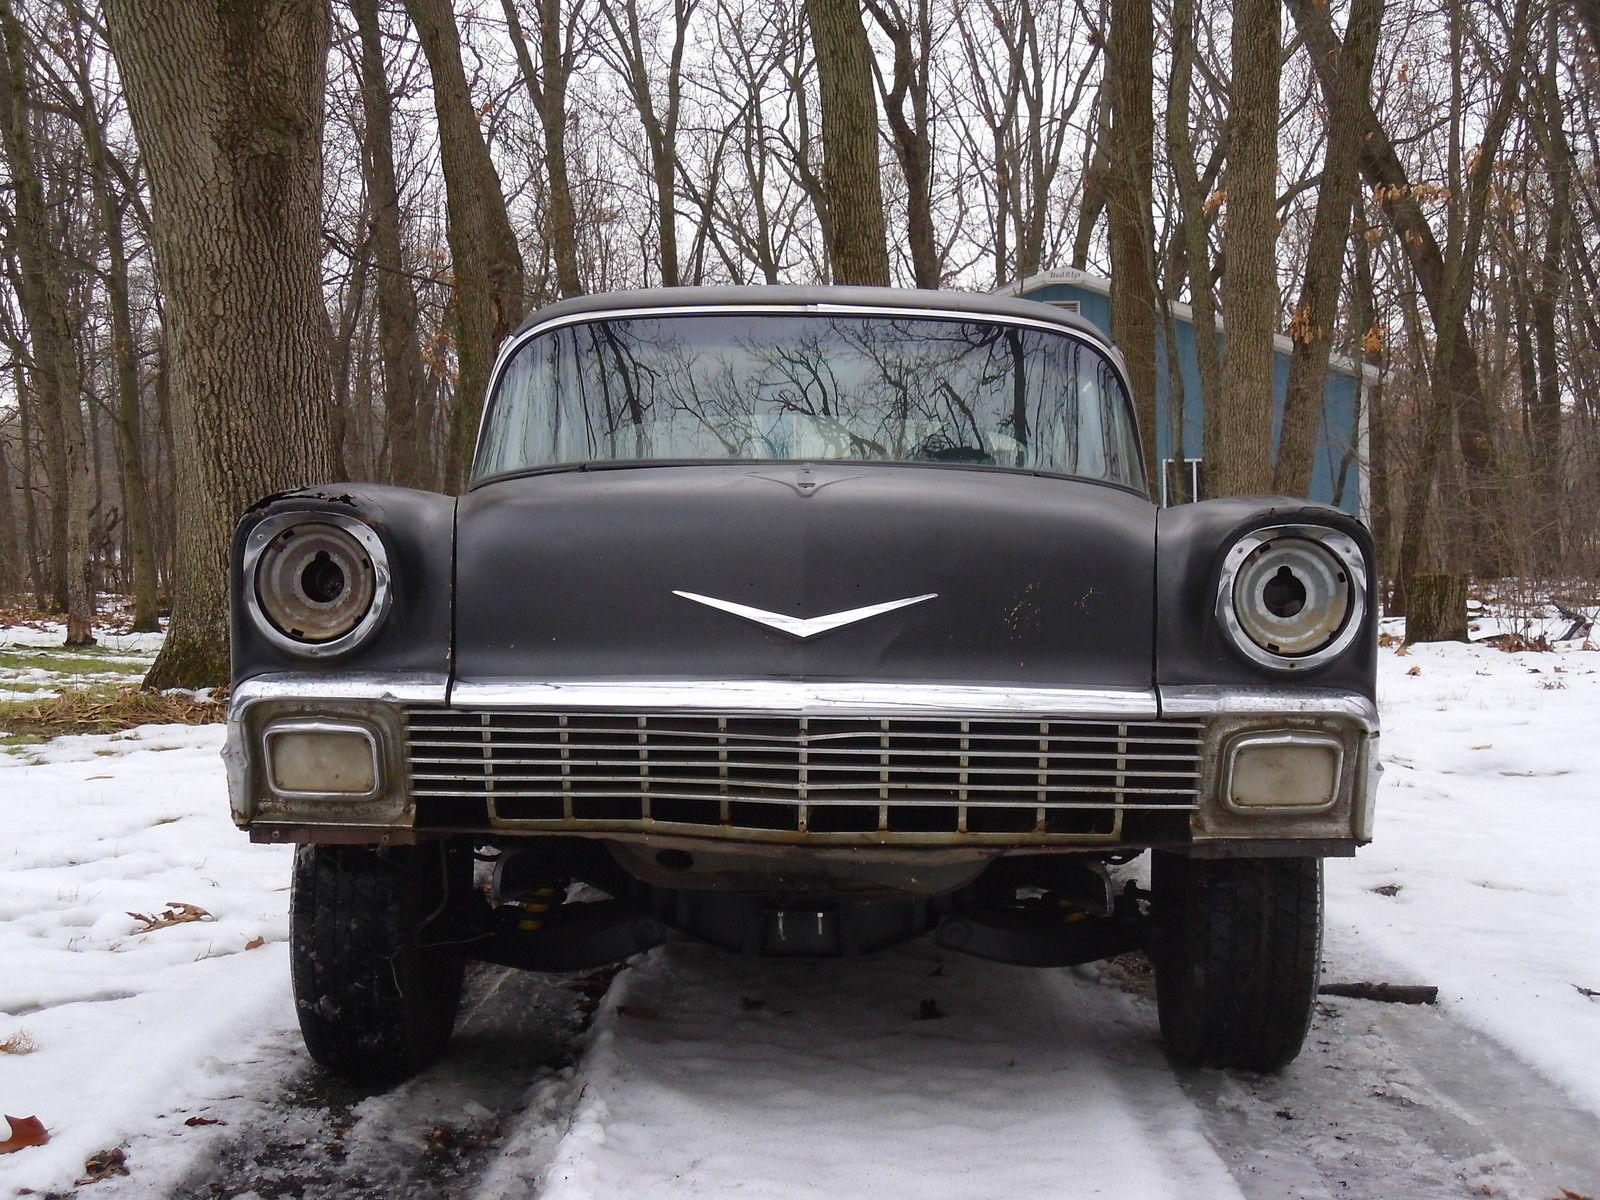 1956 chevrolet bel air custom 2 door post 161164 - Filename 1956 Chevrolet Bel Air 2 Door Post 3 Jpg